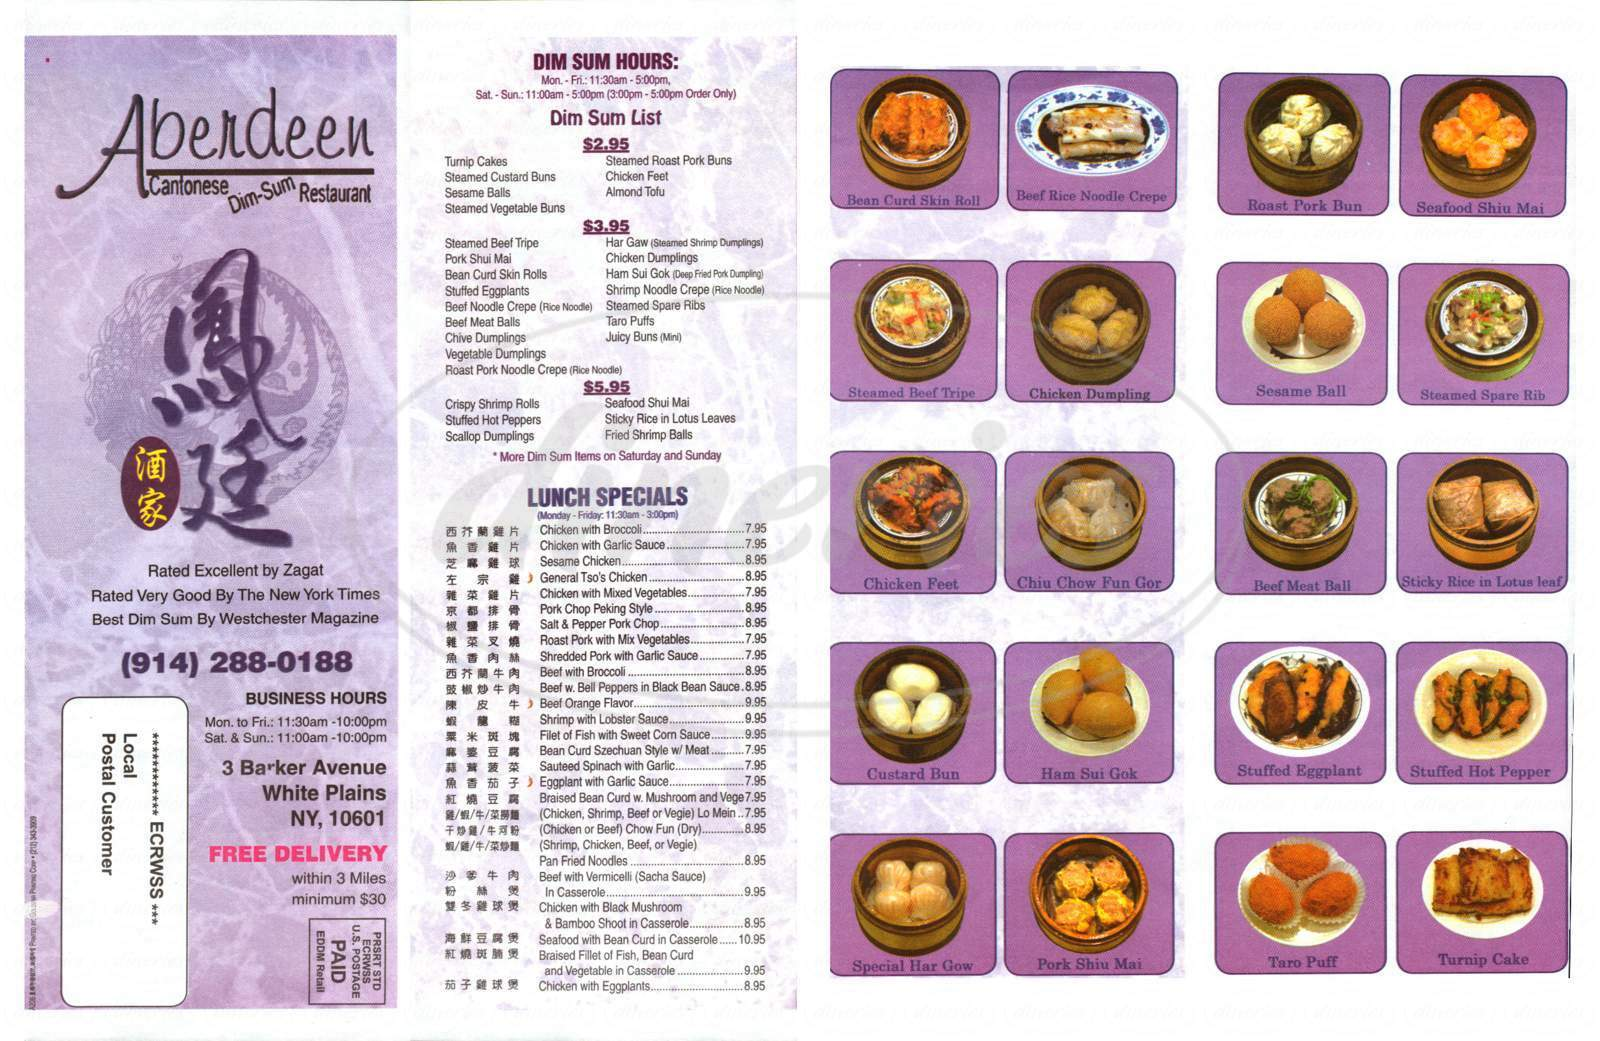 menu for Aberdeen Seafood & Dim Sum